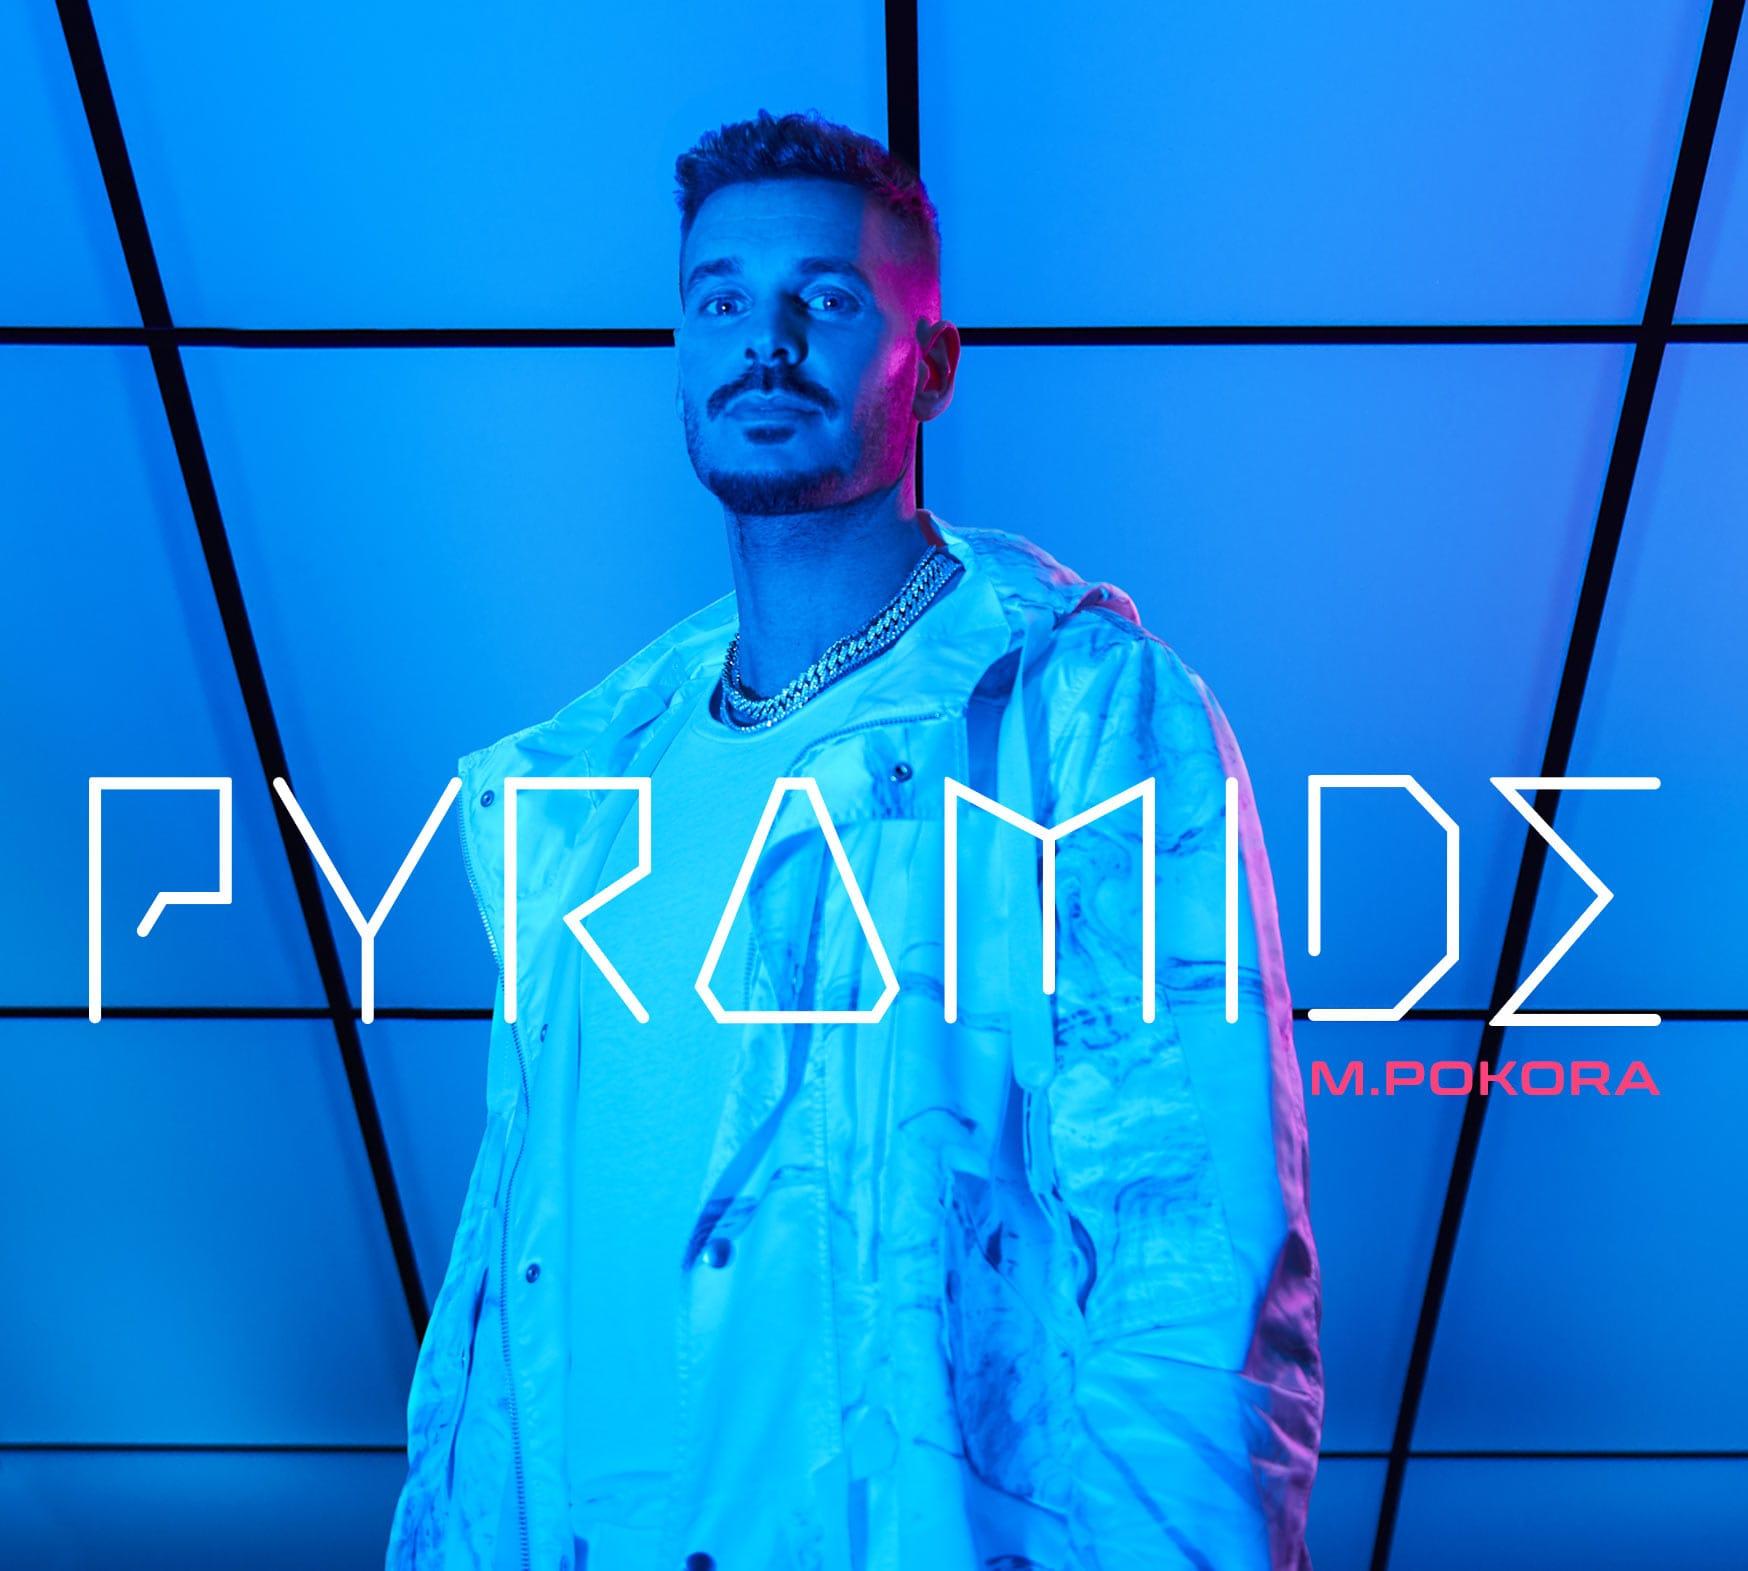 M. Pokora image pochette Cover album Pyramide réédition musique